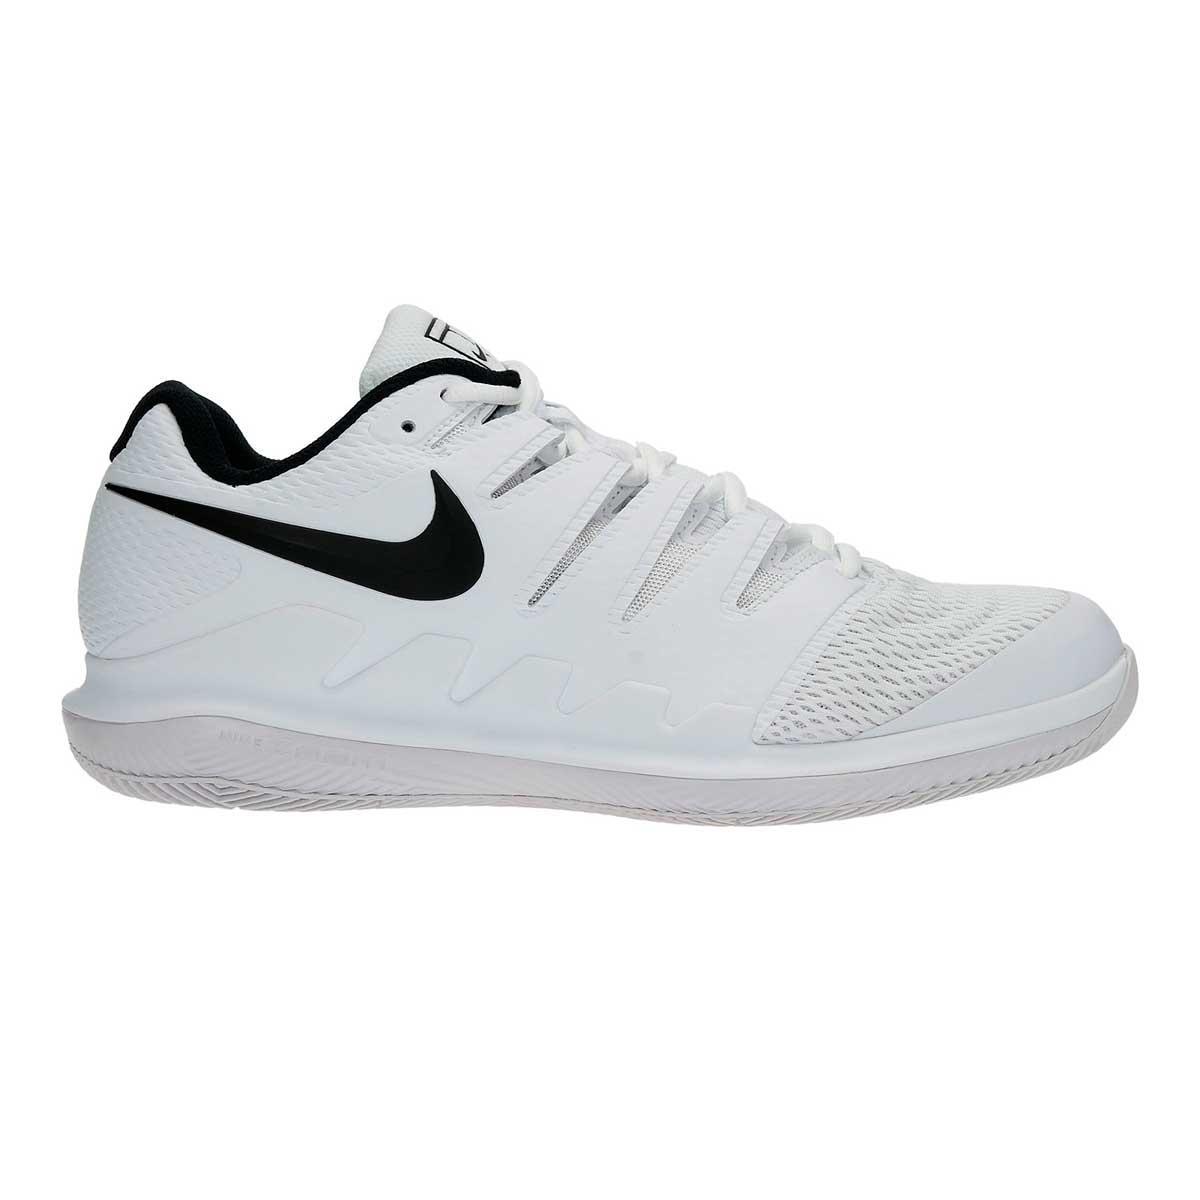 64a2acfa05c Tênis Nike Air Zoom Vapor X HC